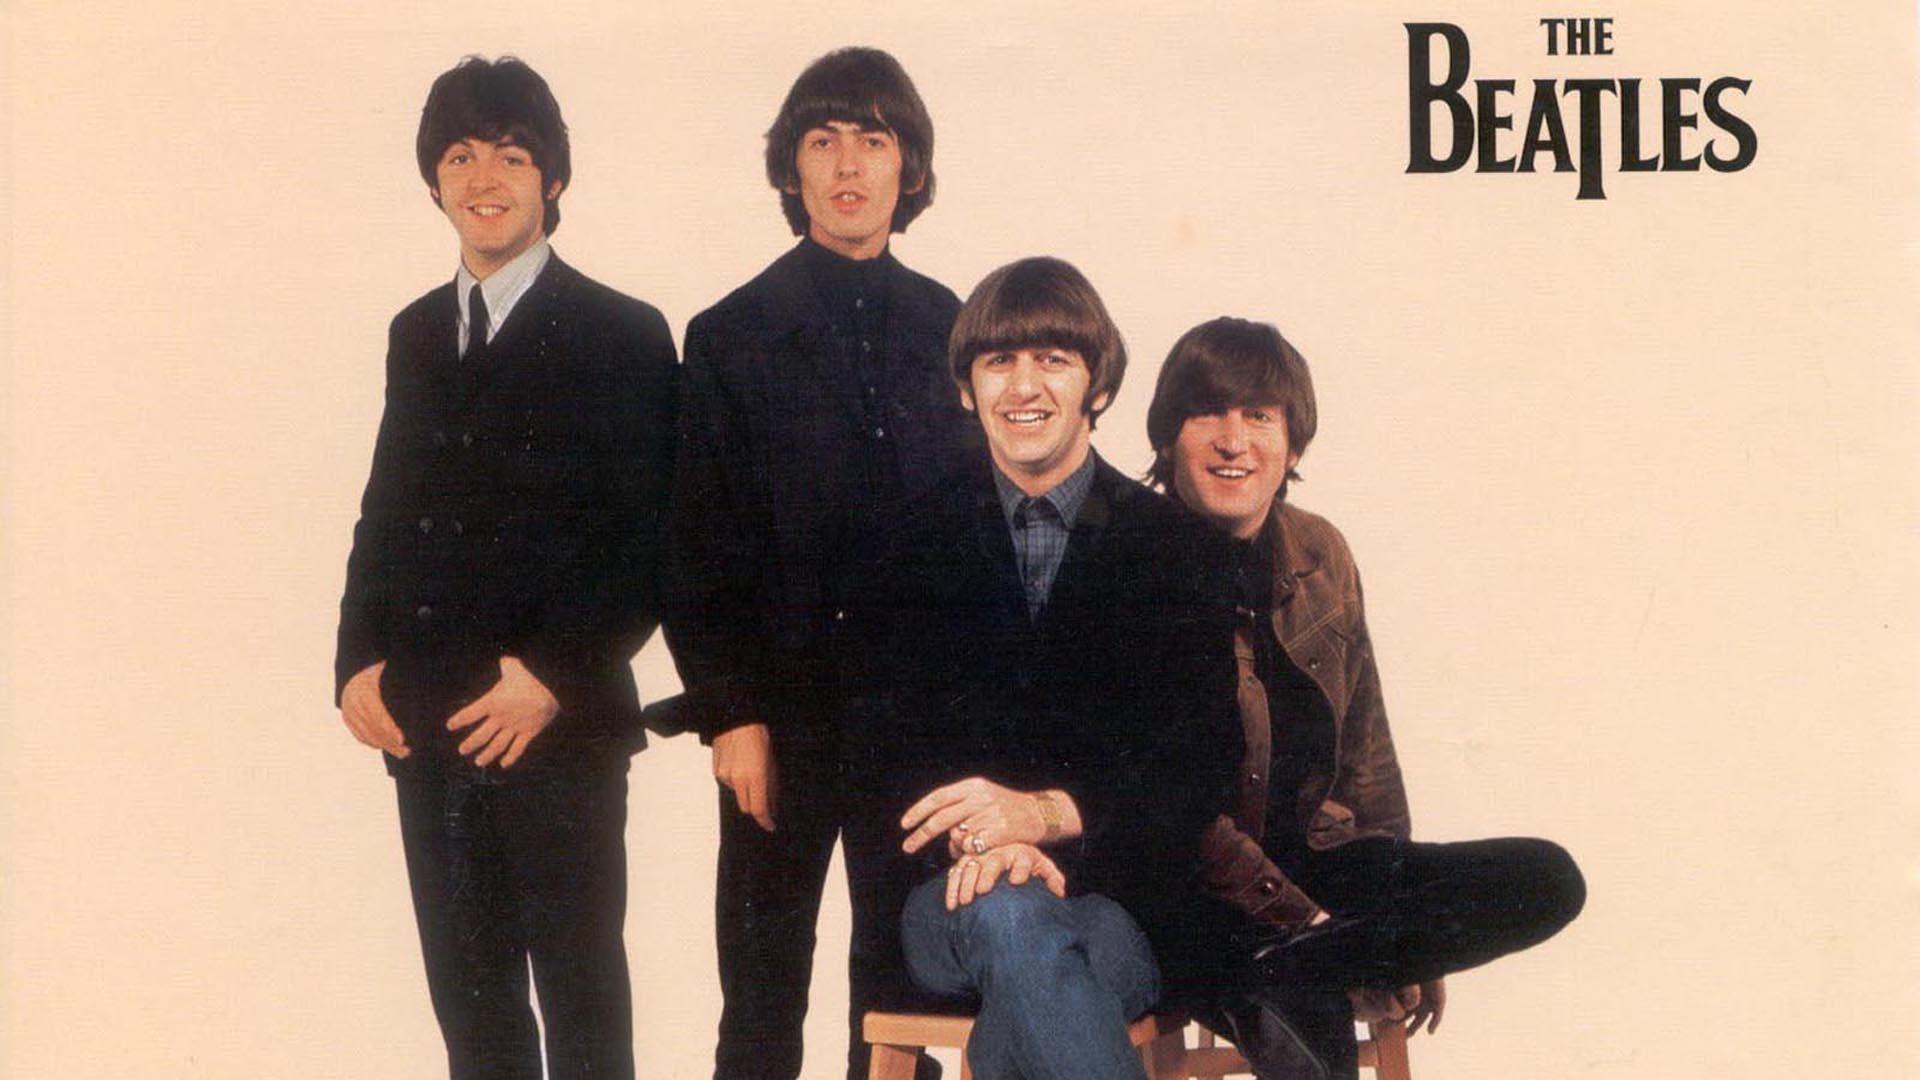 Peachy Beatles Beatles Wallpaper The Beatles Beatles Wallpaper Iphone